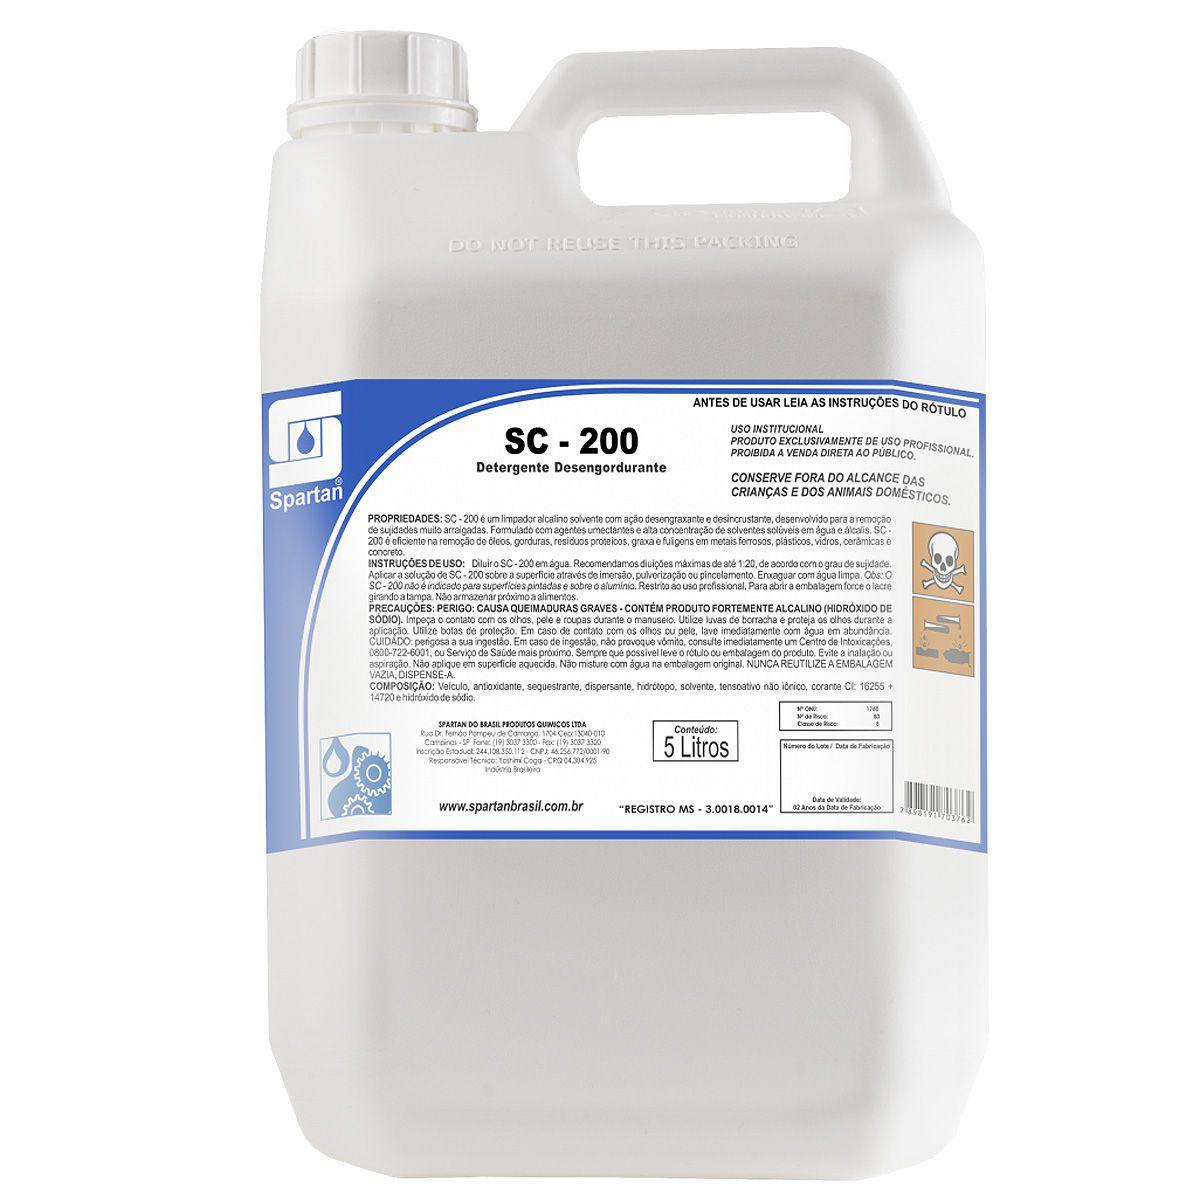 Detergente Desengraxante Alcalino Bl-10 Spartan 5 Litros